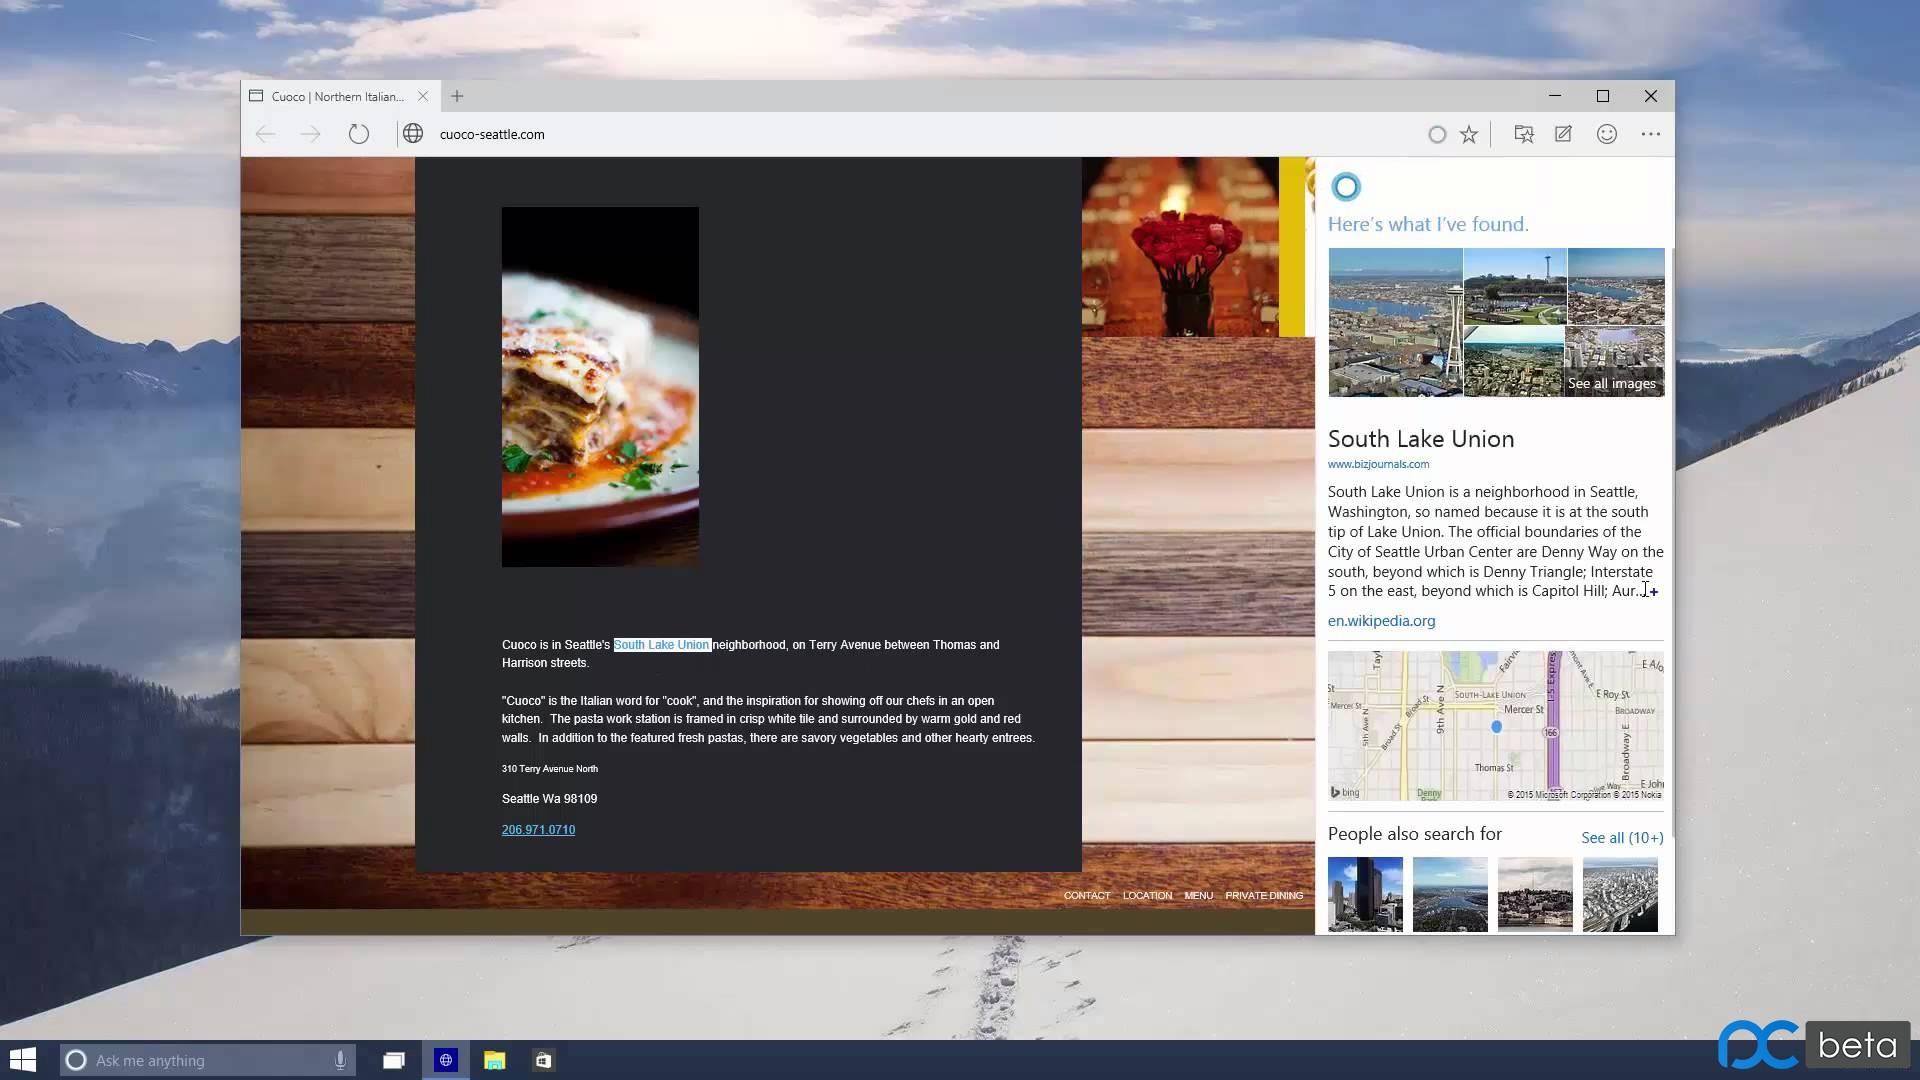 WPDang_Project_Spartan_Cortana